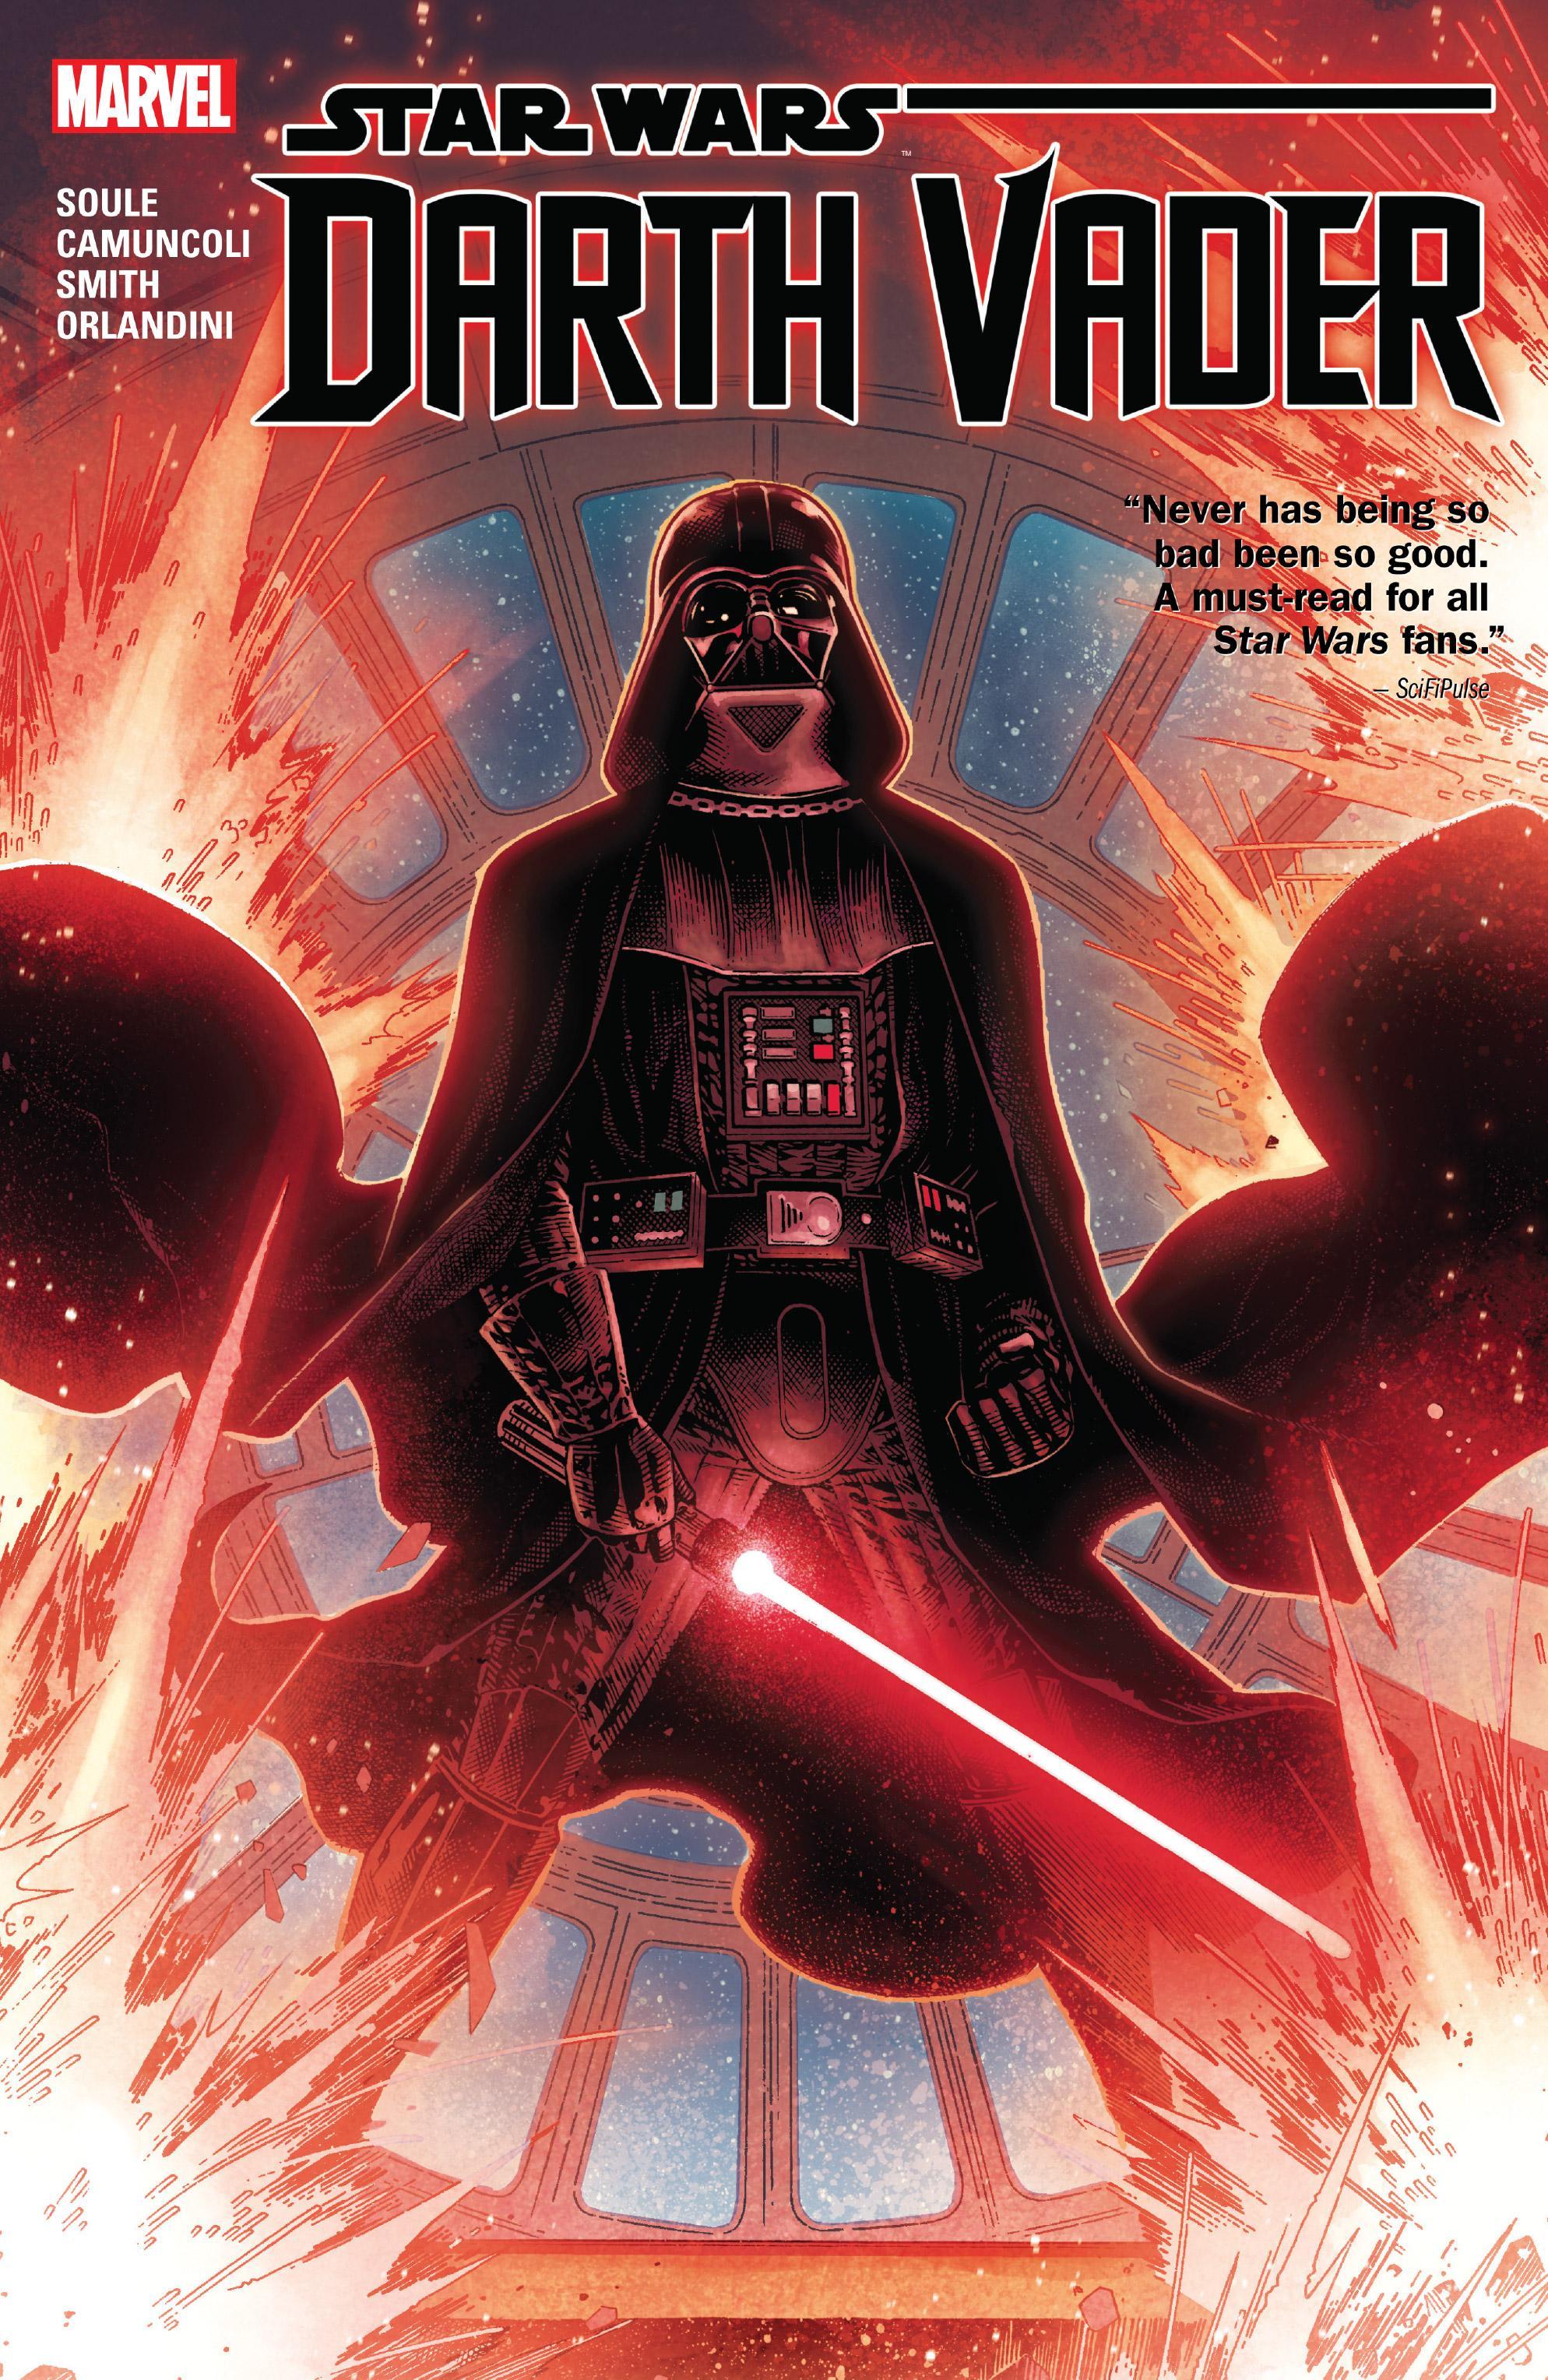 Star Wars - Darth Vader - Dark Lord Of The Sith Collection v01 (2019) (Digital) (Asgard-Empire